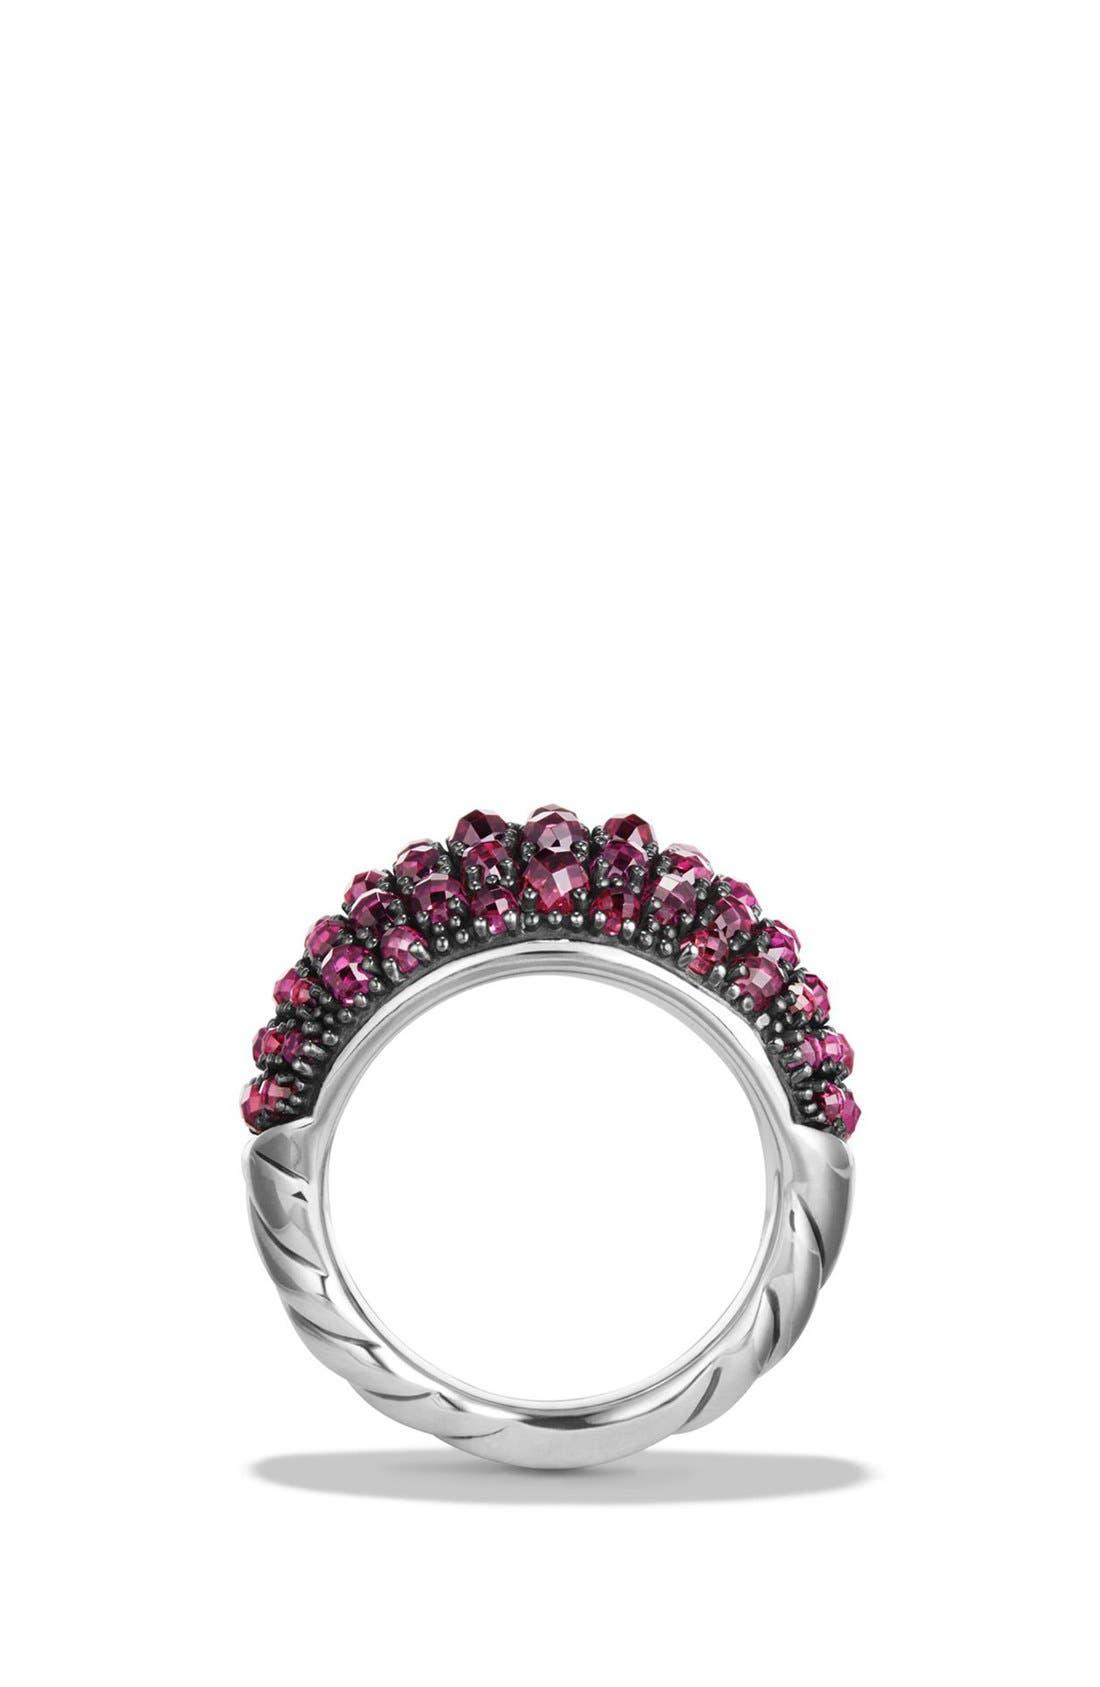 Osetra Dome Ring,                             Alternate thumbnail 2, color,                             Rhodalite